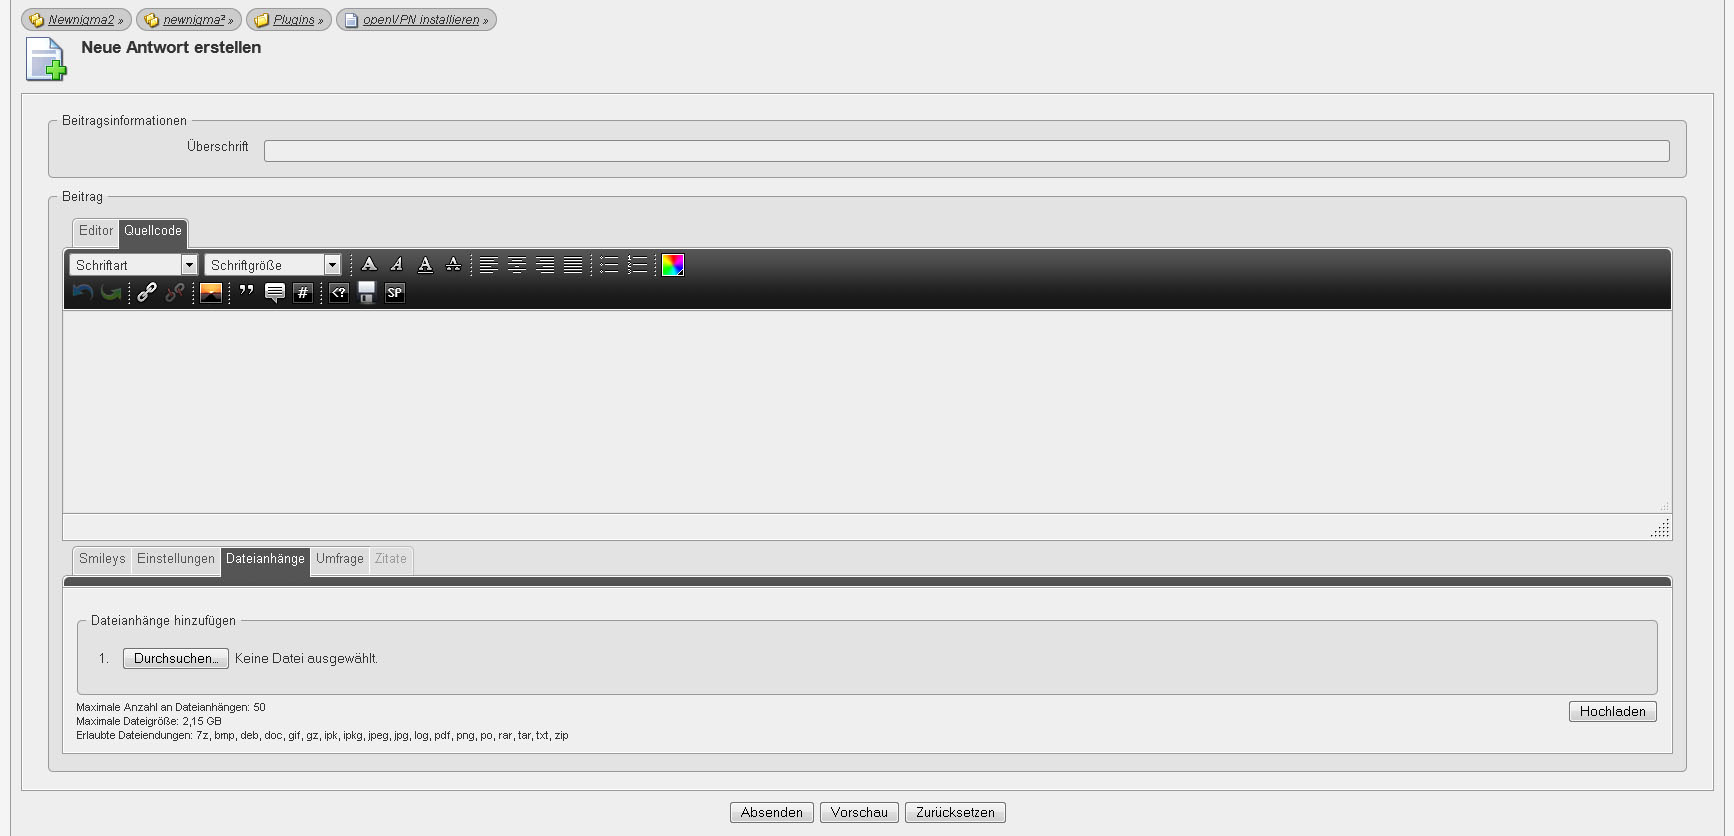 openVPN installieren - Plugins - Newnigma²